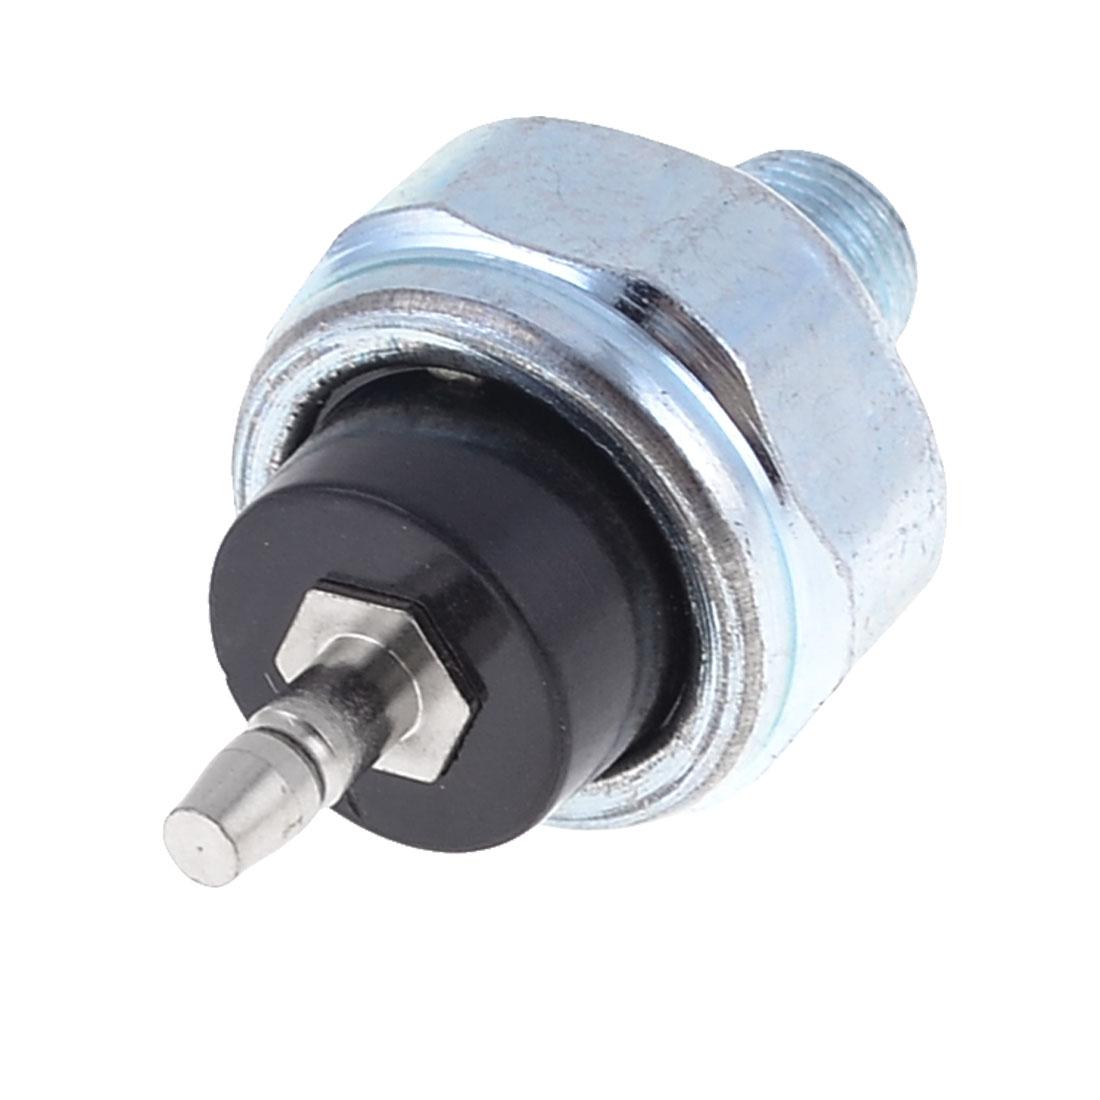 37240-PT0-023 Car Auto Engine Oil Pressure Switch Sensor Accessory Part